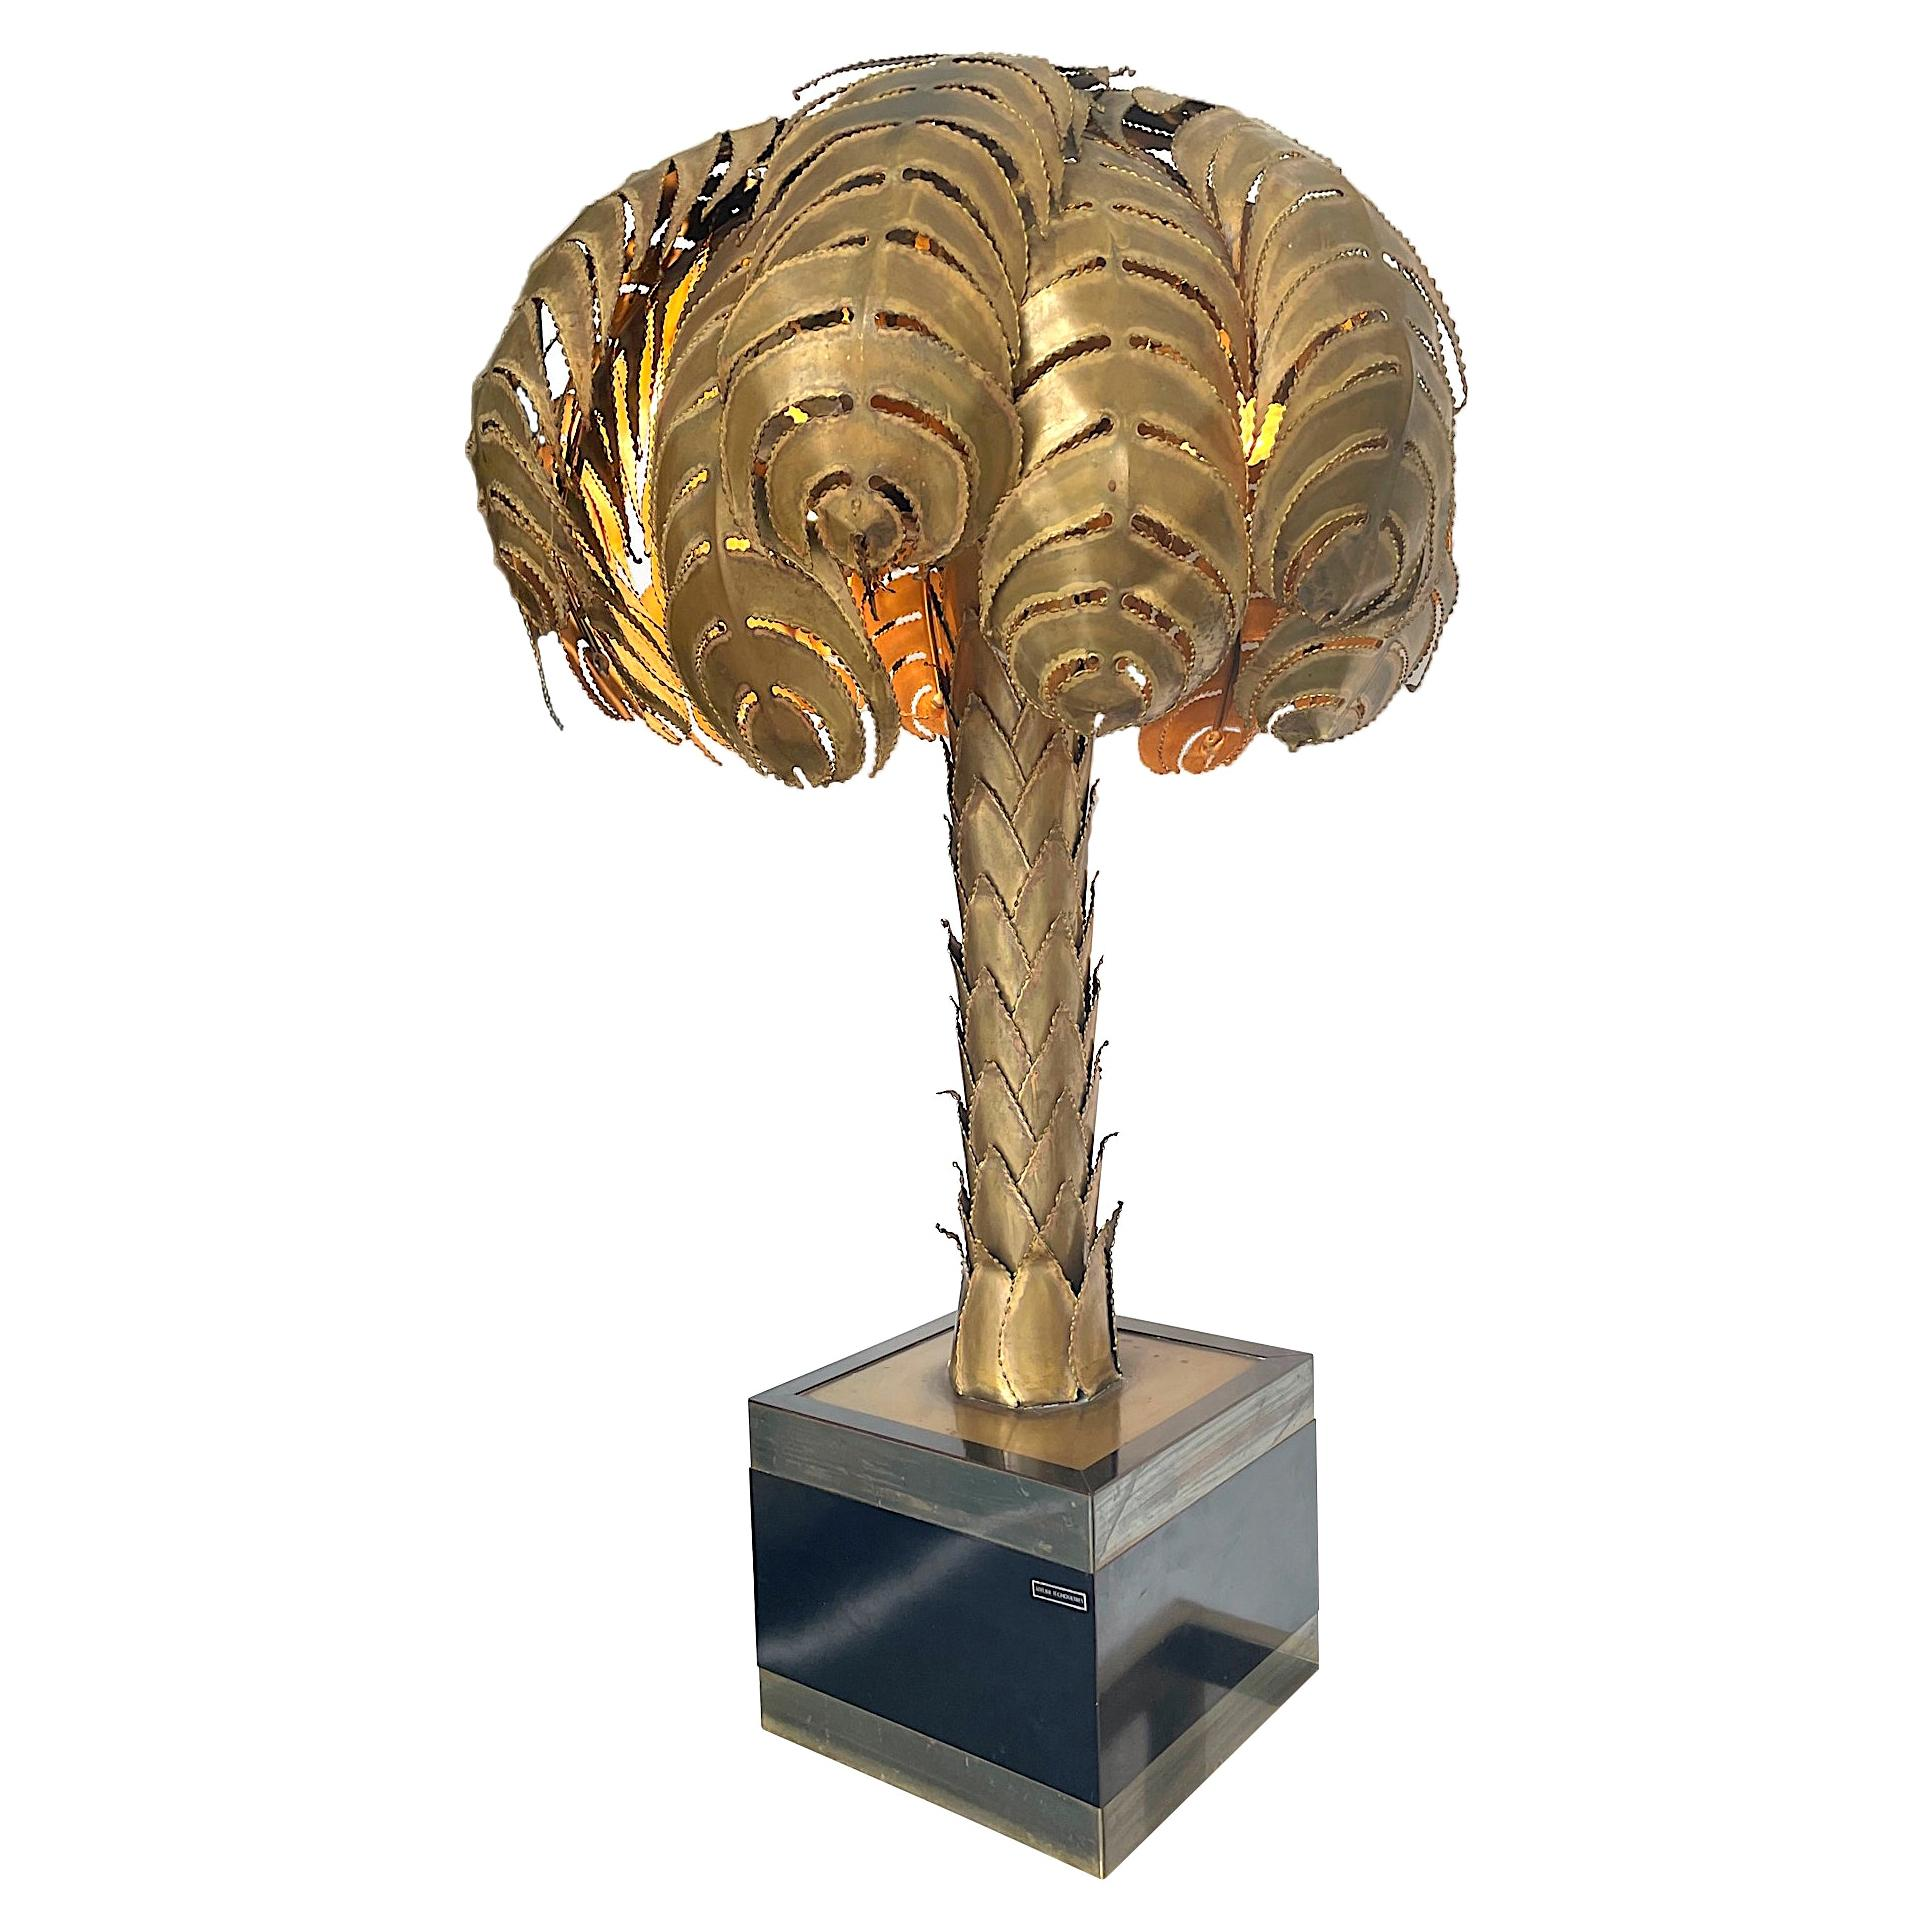 Orignal Maison Jansen Torch Cut Brass Palm Tree Lamp with Original Label